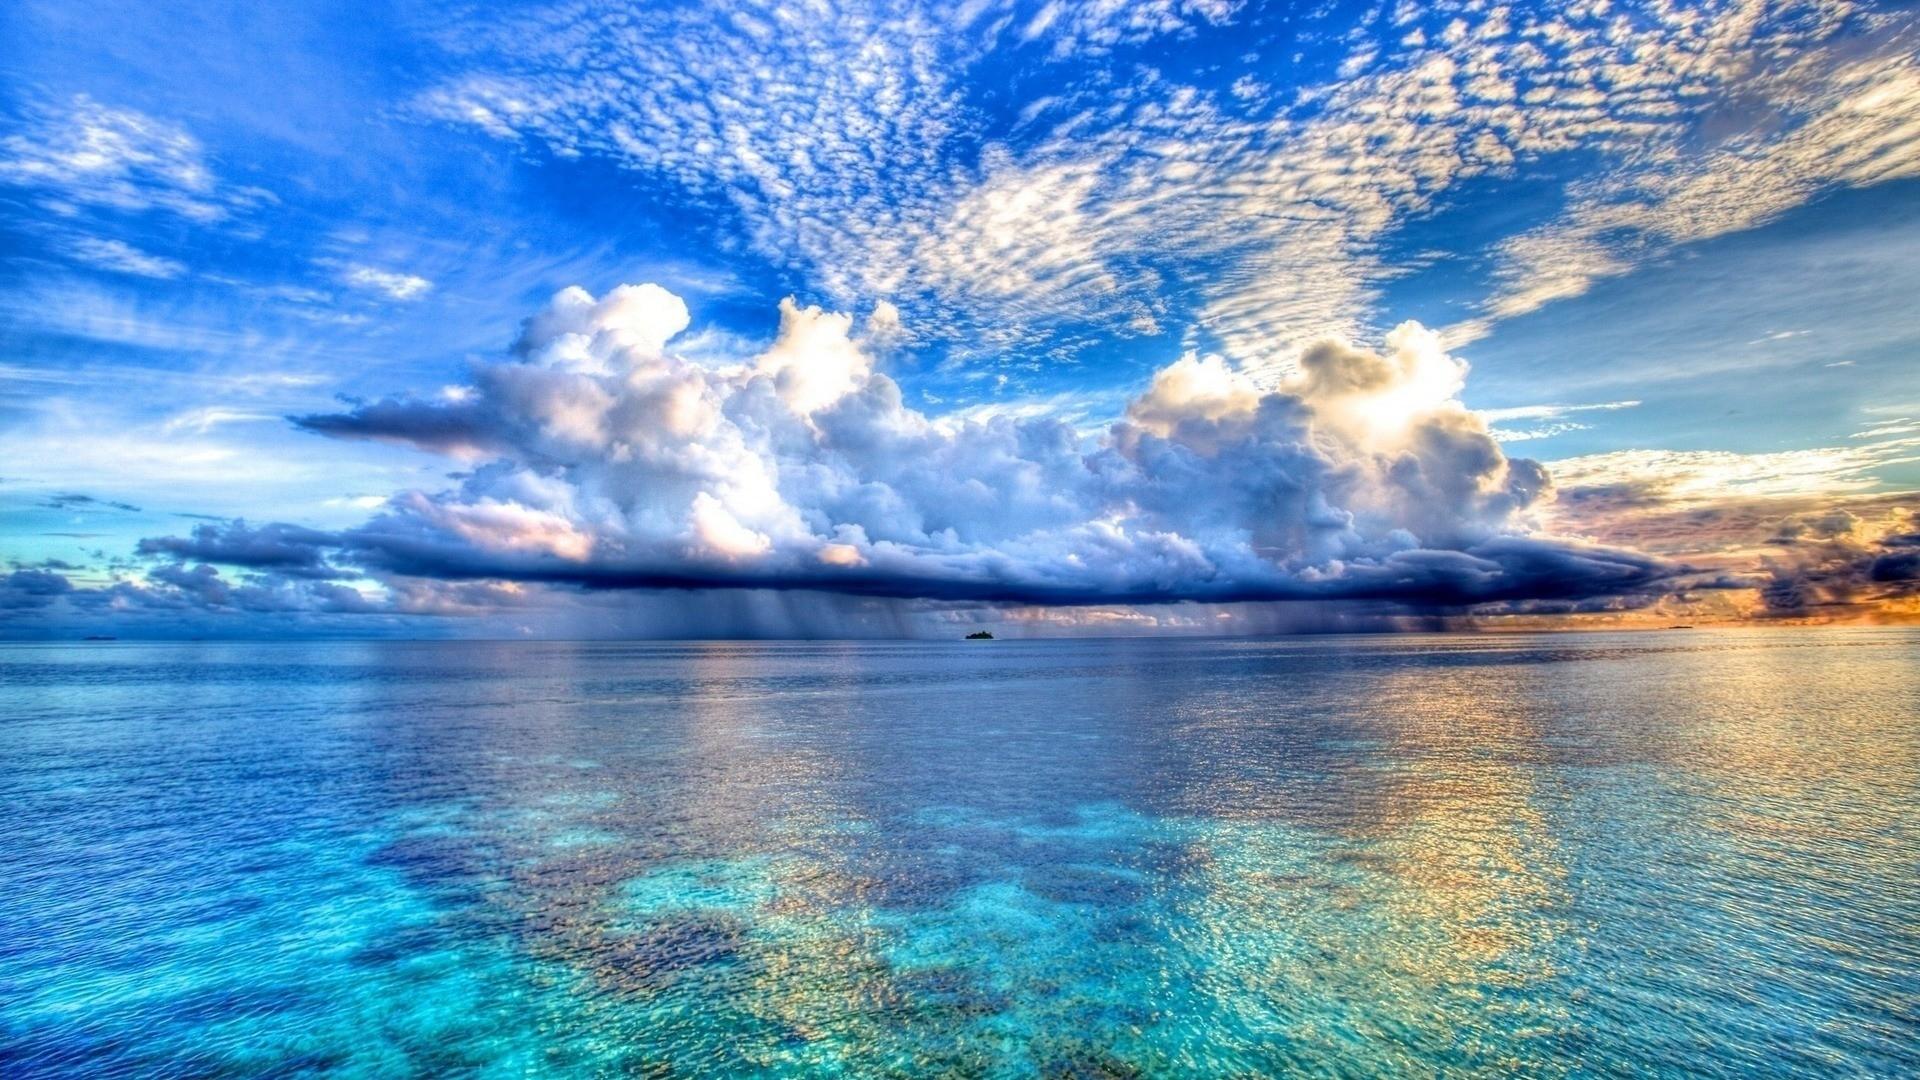 ocean picture wallpaper full hd for pc cool oceans ~ gipsypixel